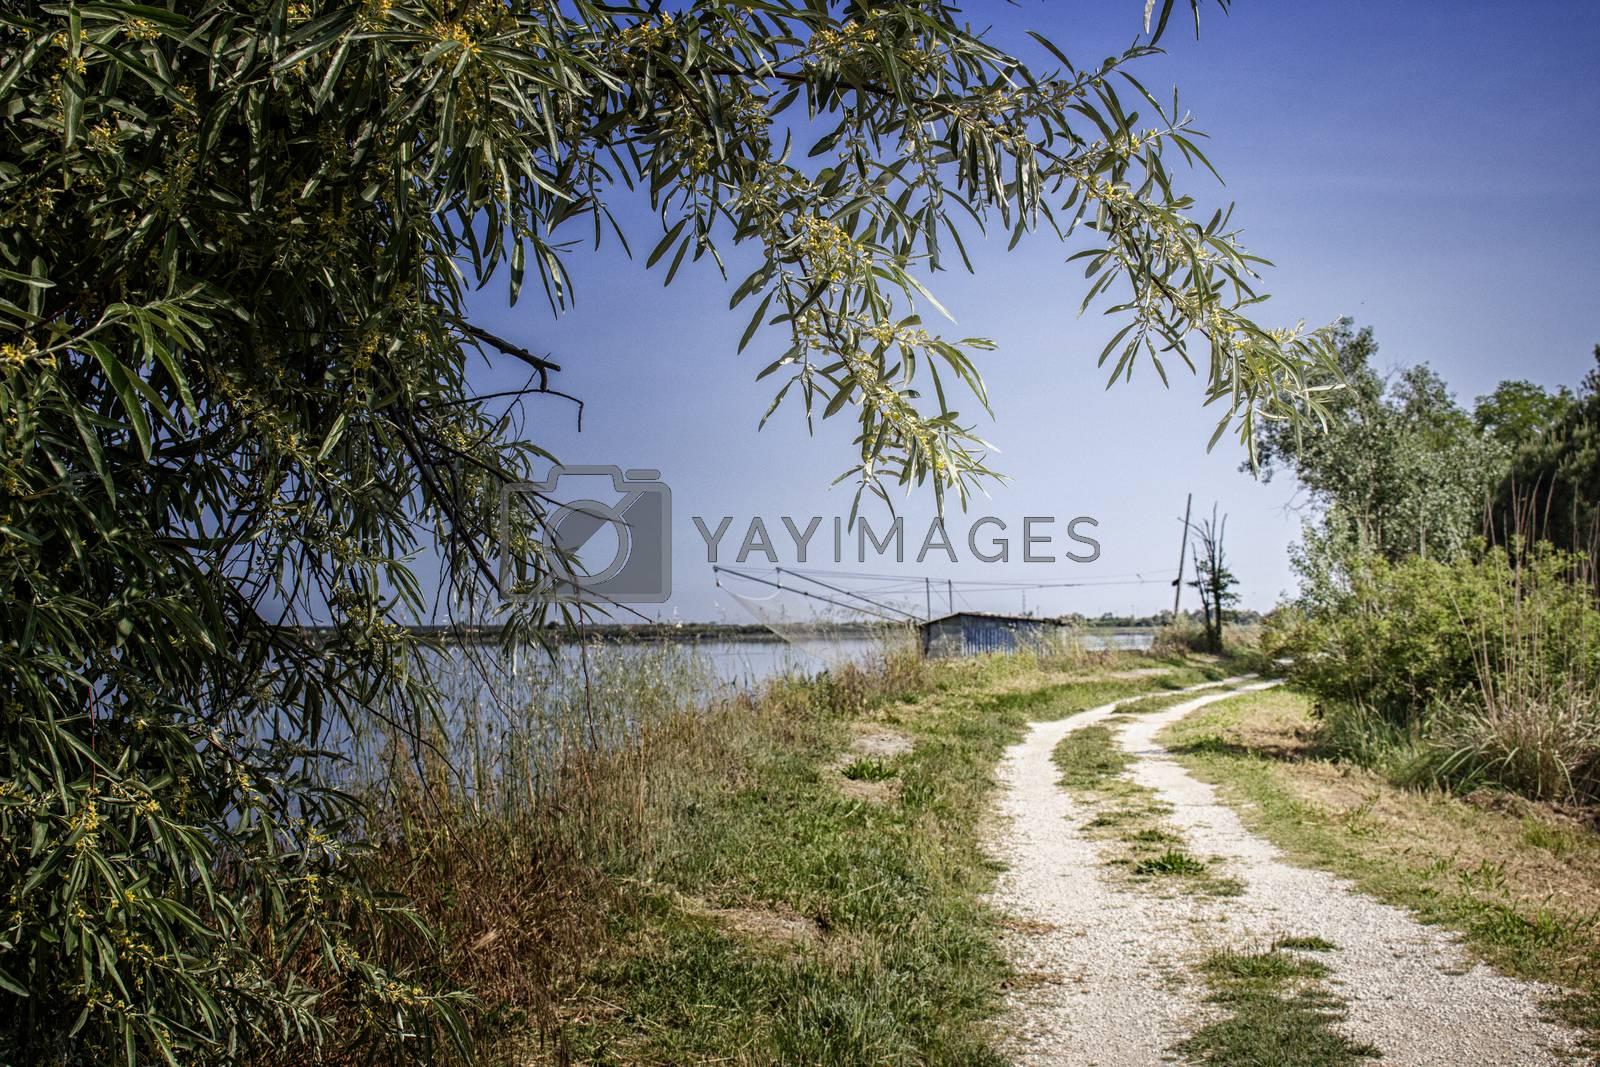 walking in the pinewood forest on the Pialassa della Baiona brackish lagoon near Marina Romea along te  Adriatic seaside in Ravenna (Italy)